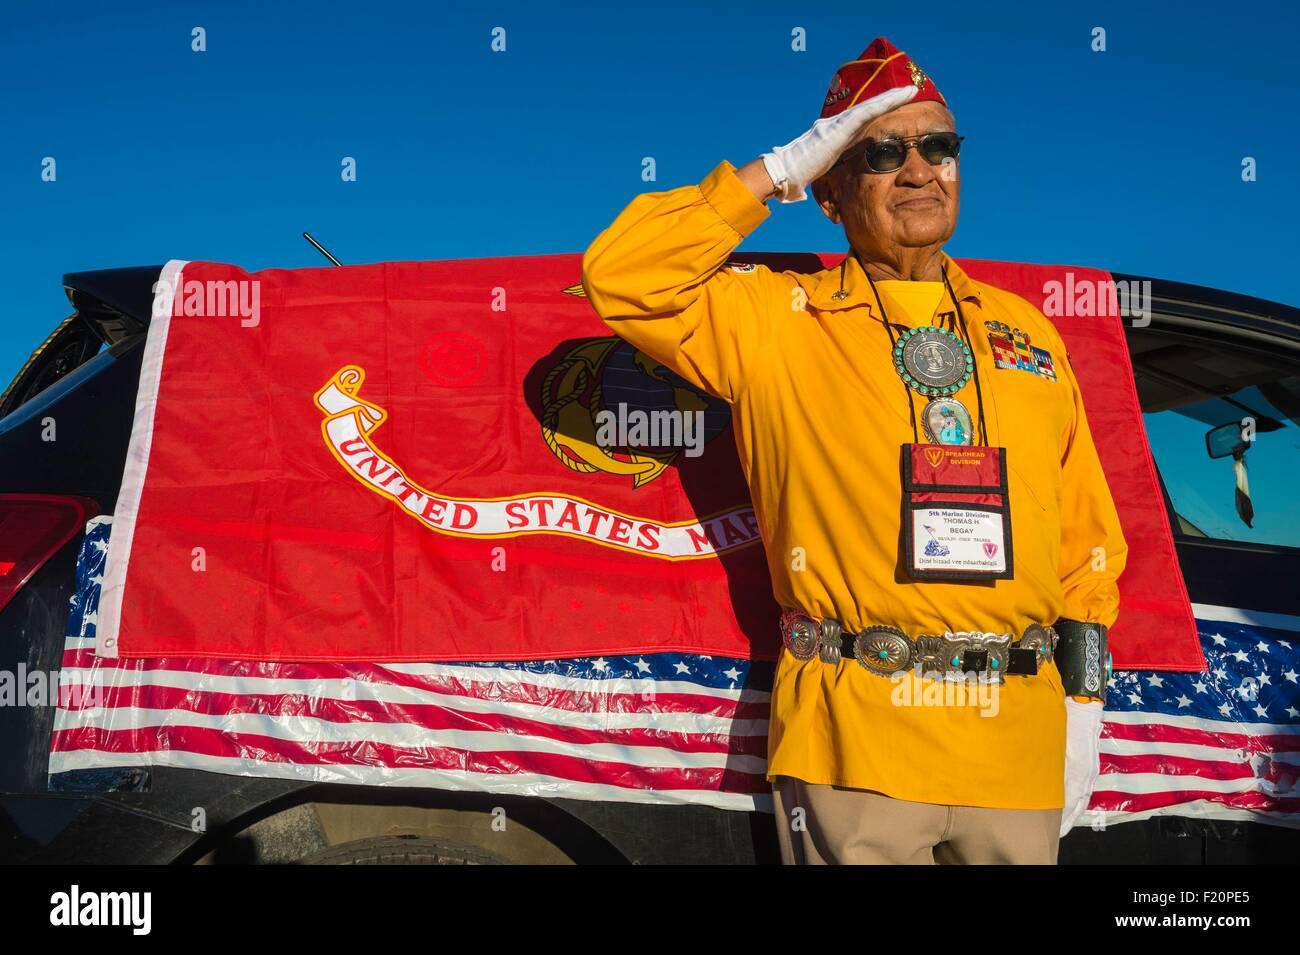 USA, Arizona, Window Rock, Festival Navajo Nation Fair, Parade, Navajo Code talker Stockbild